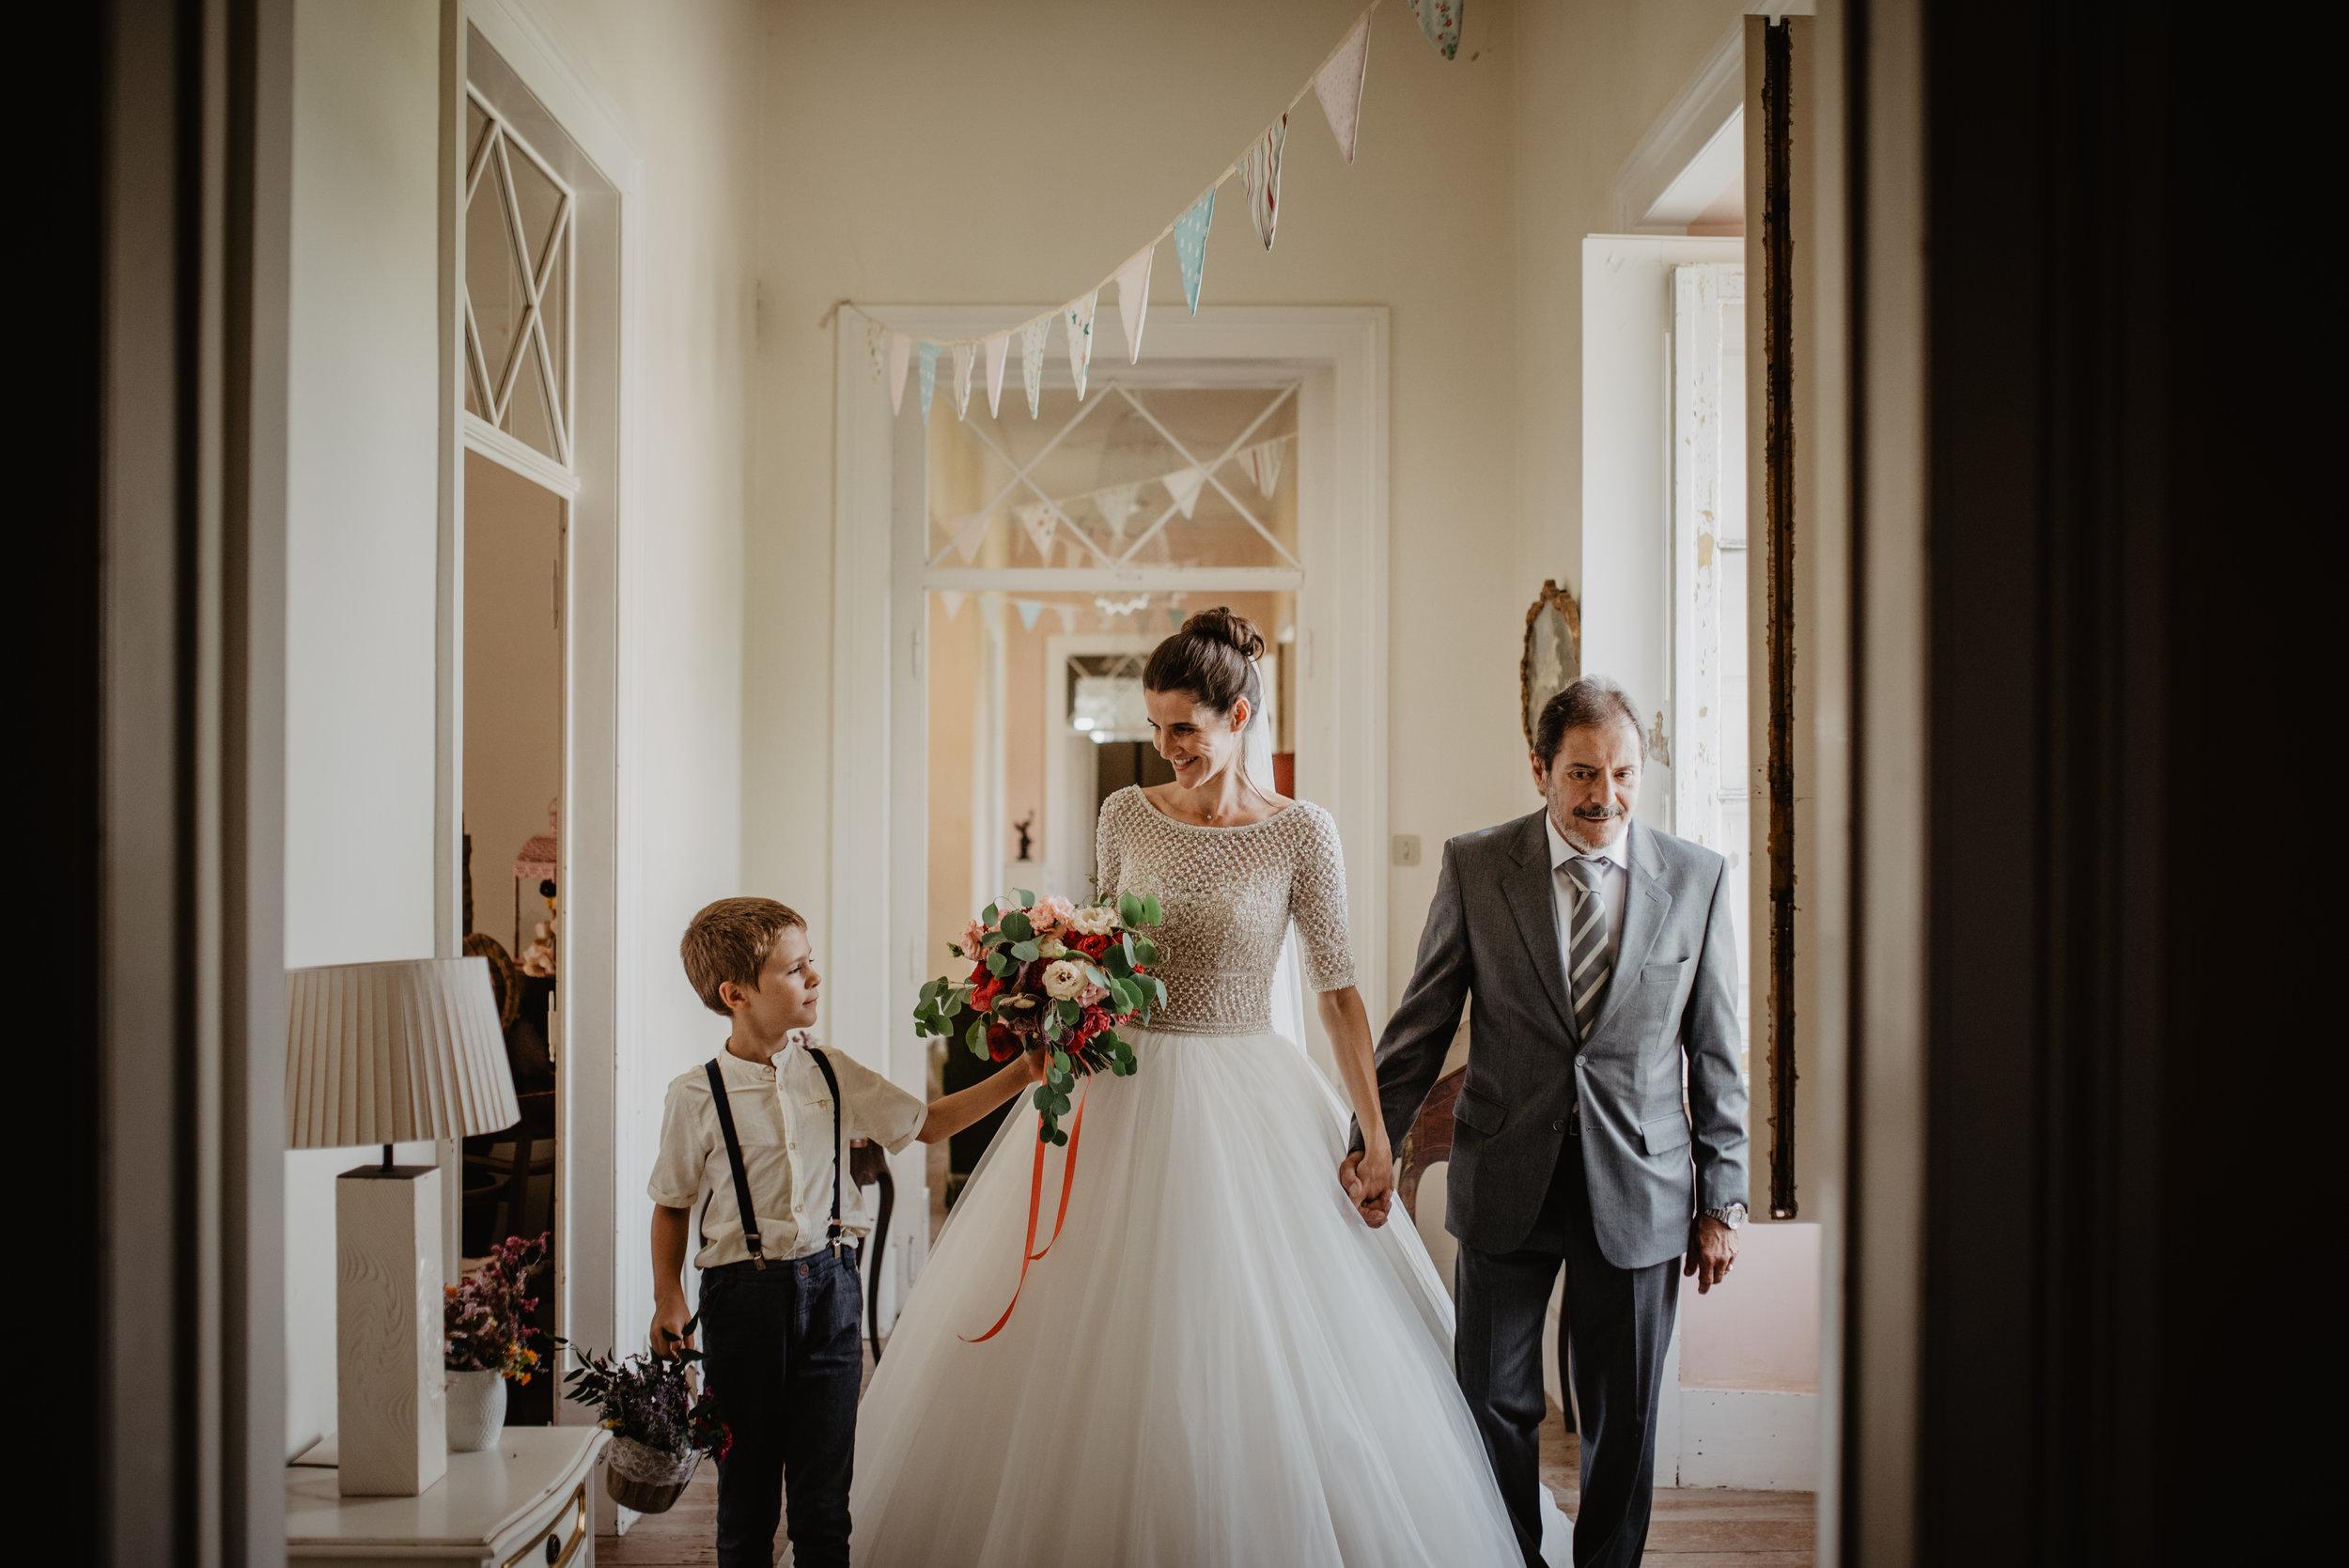 Lapela-photography-wedding-sintra-portugal-48.jpg